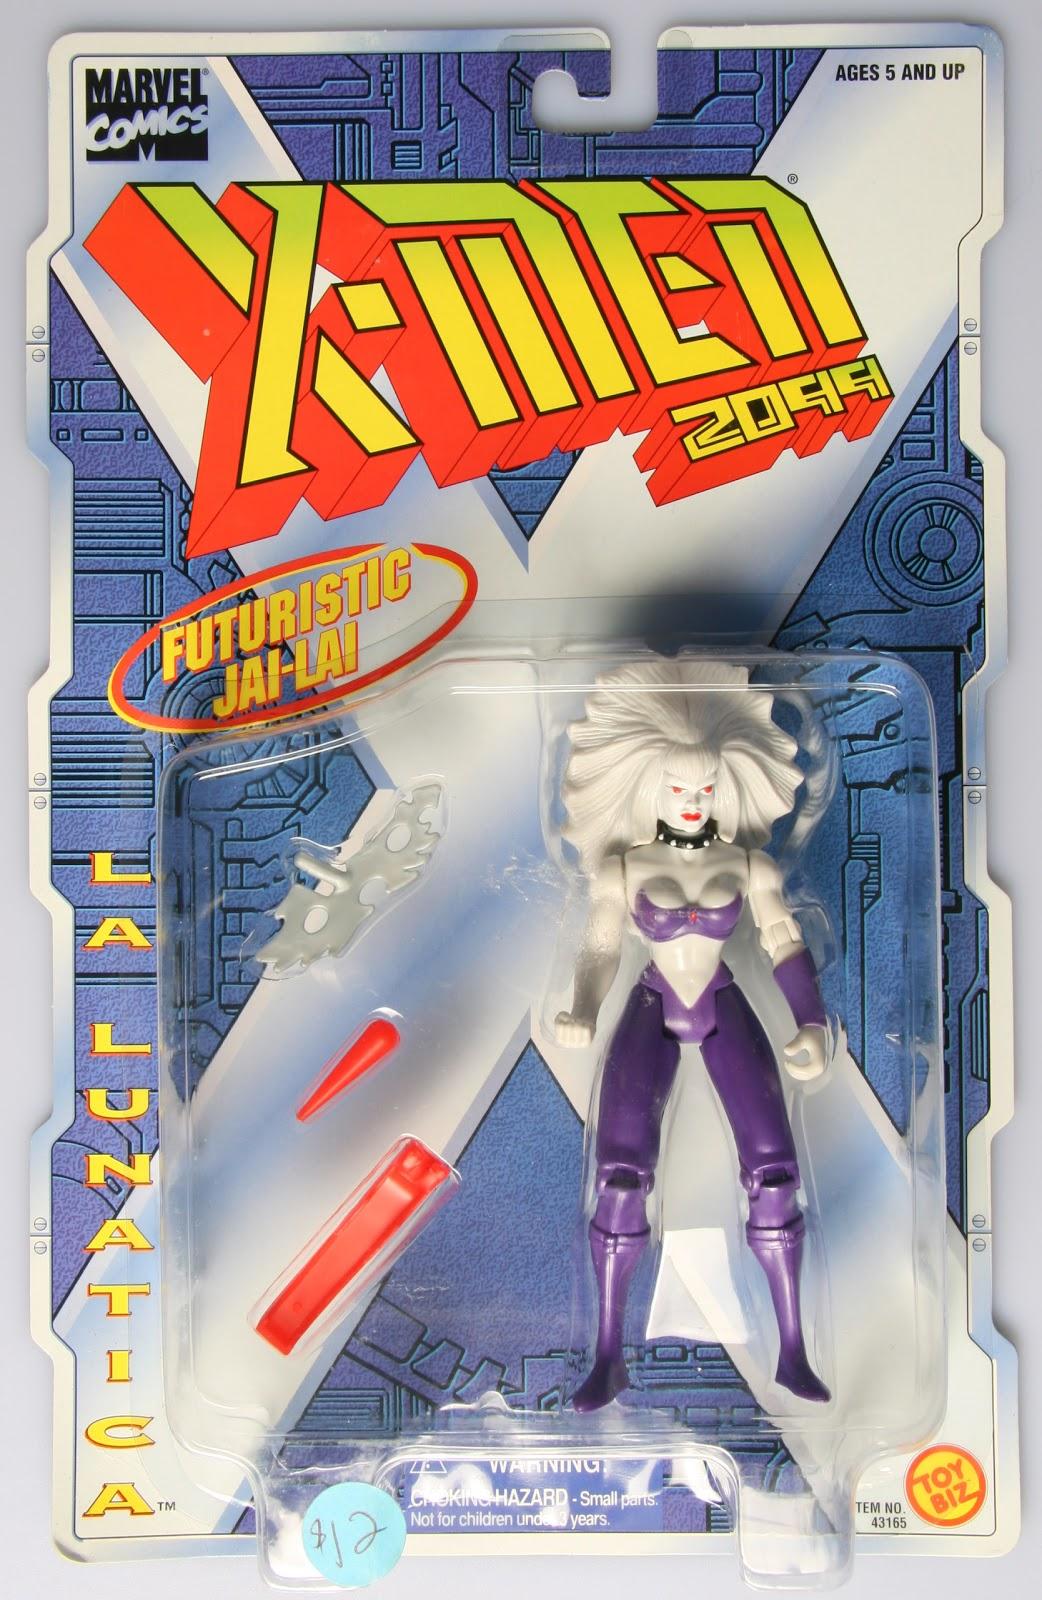 LA LUNATICA MARVEL COMICS X-MEN 2099 ACTION FIGURE